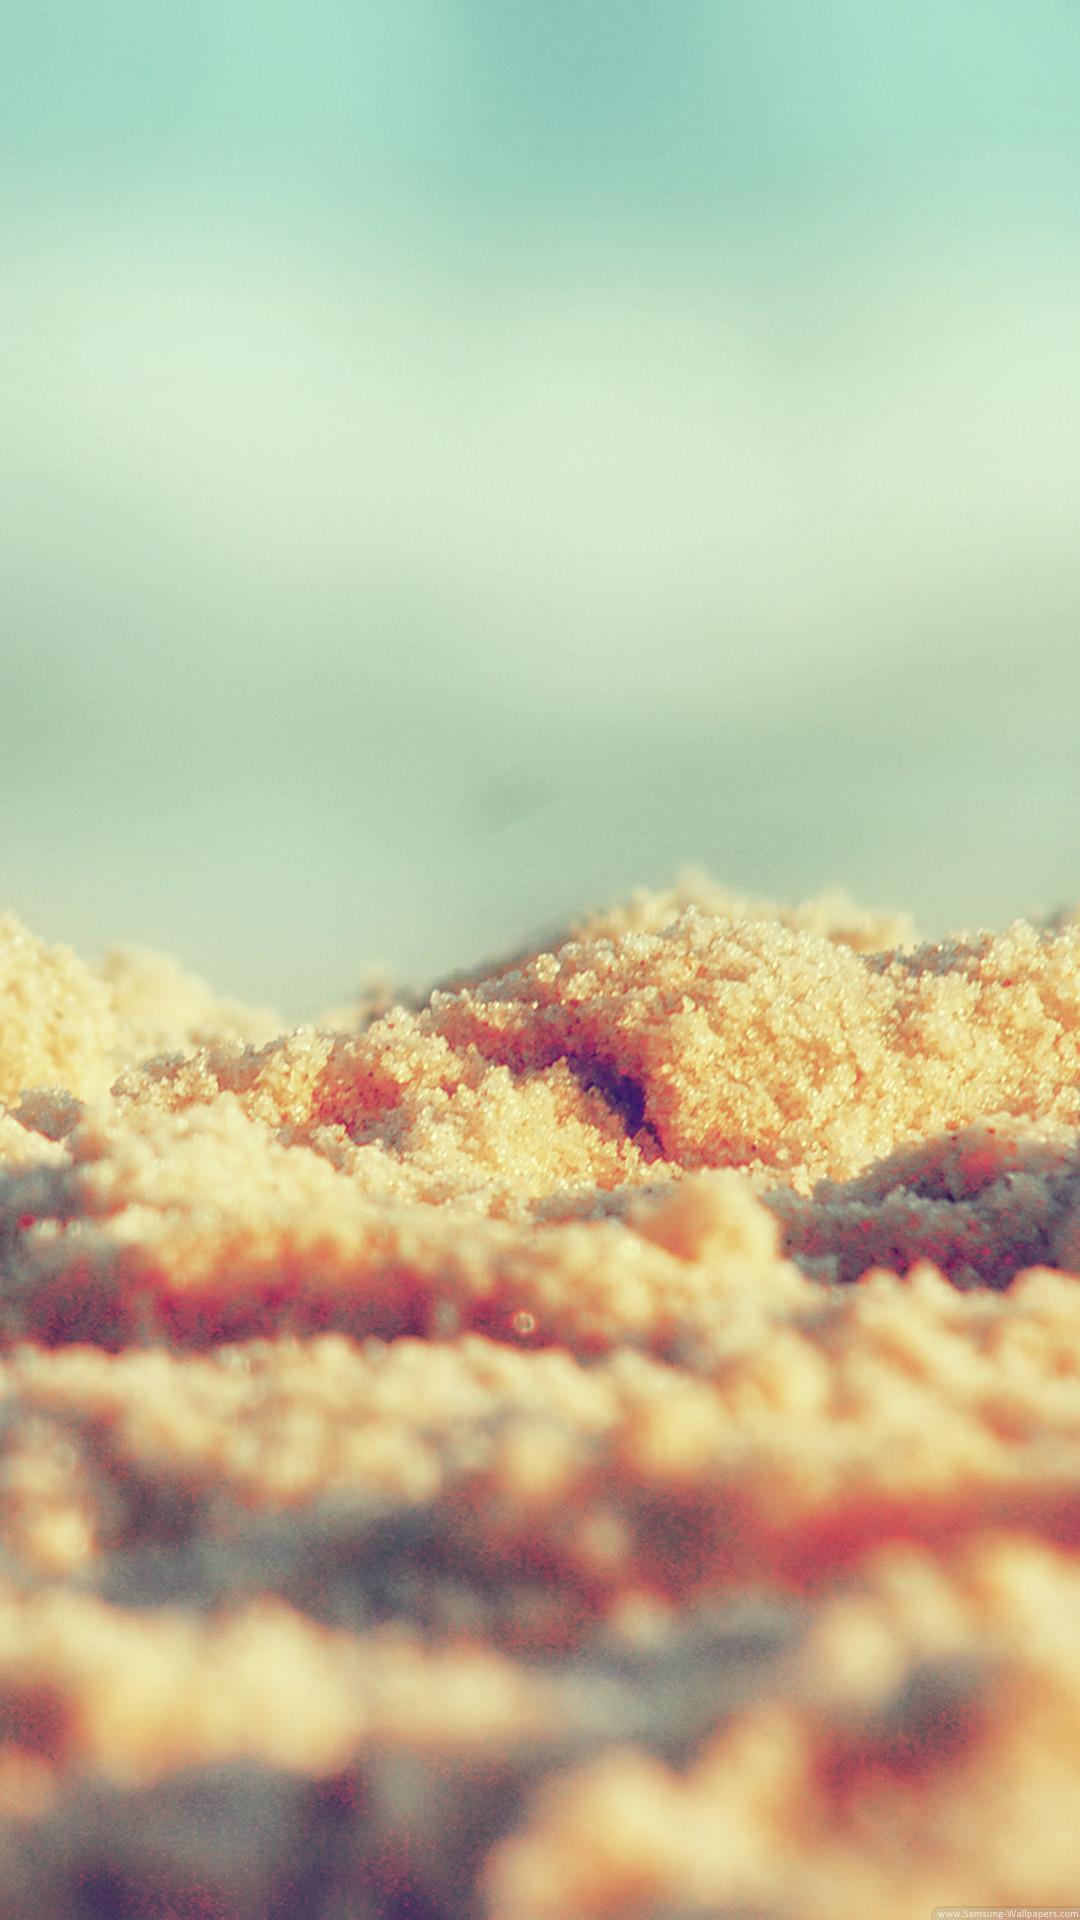 Beach Sand Texture Close-up iPhone 6 Plus HD Wallpaper …